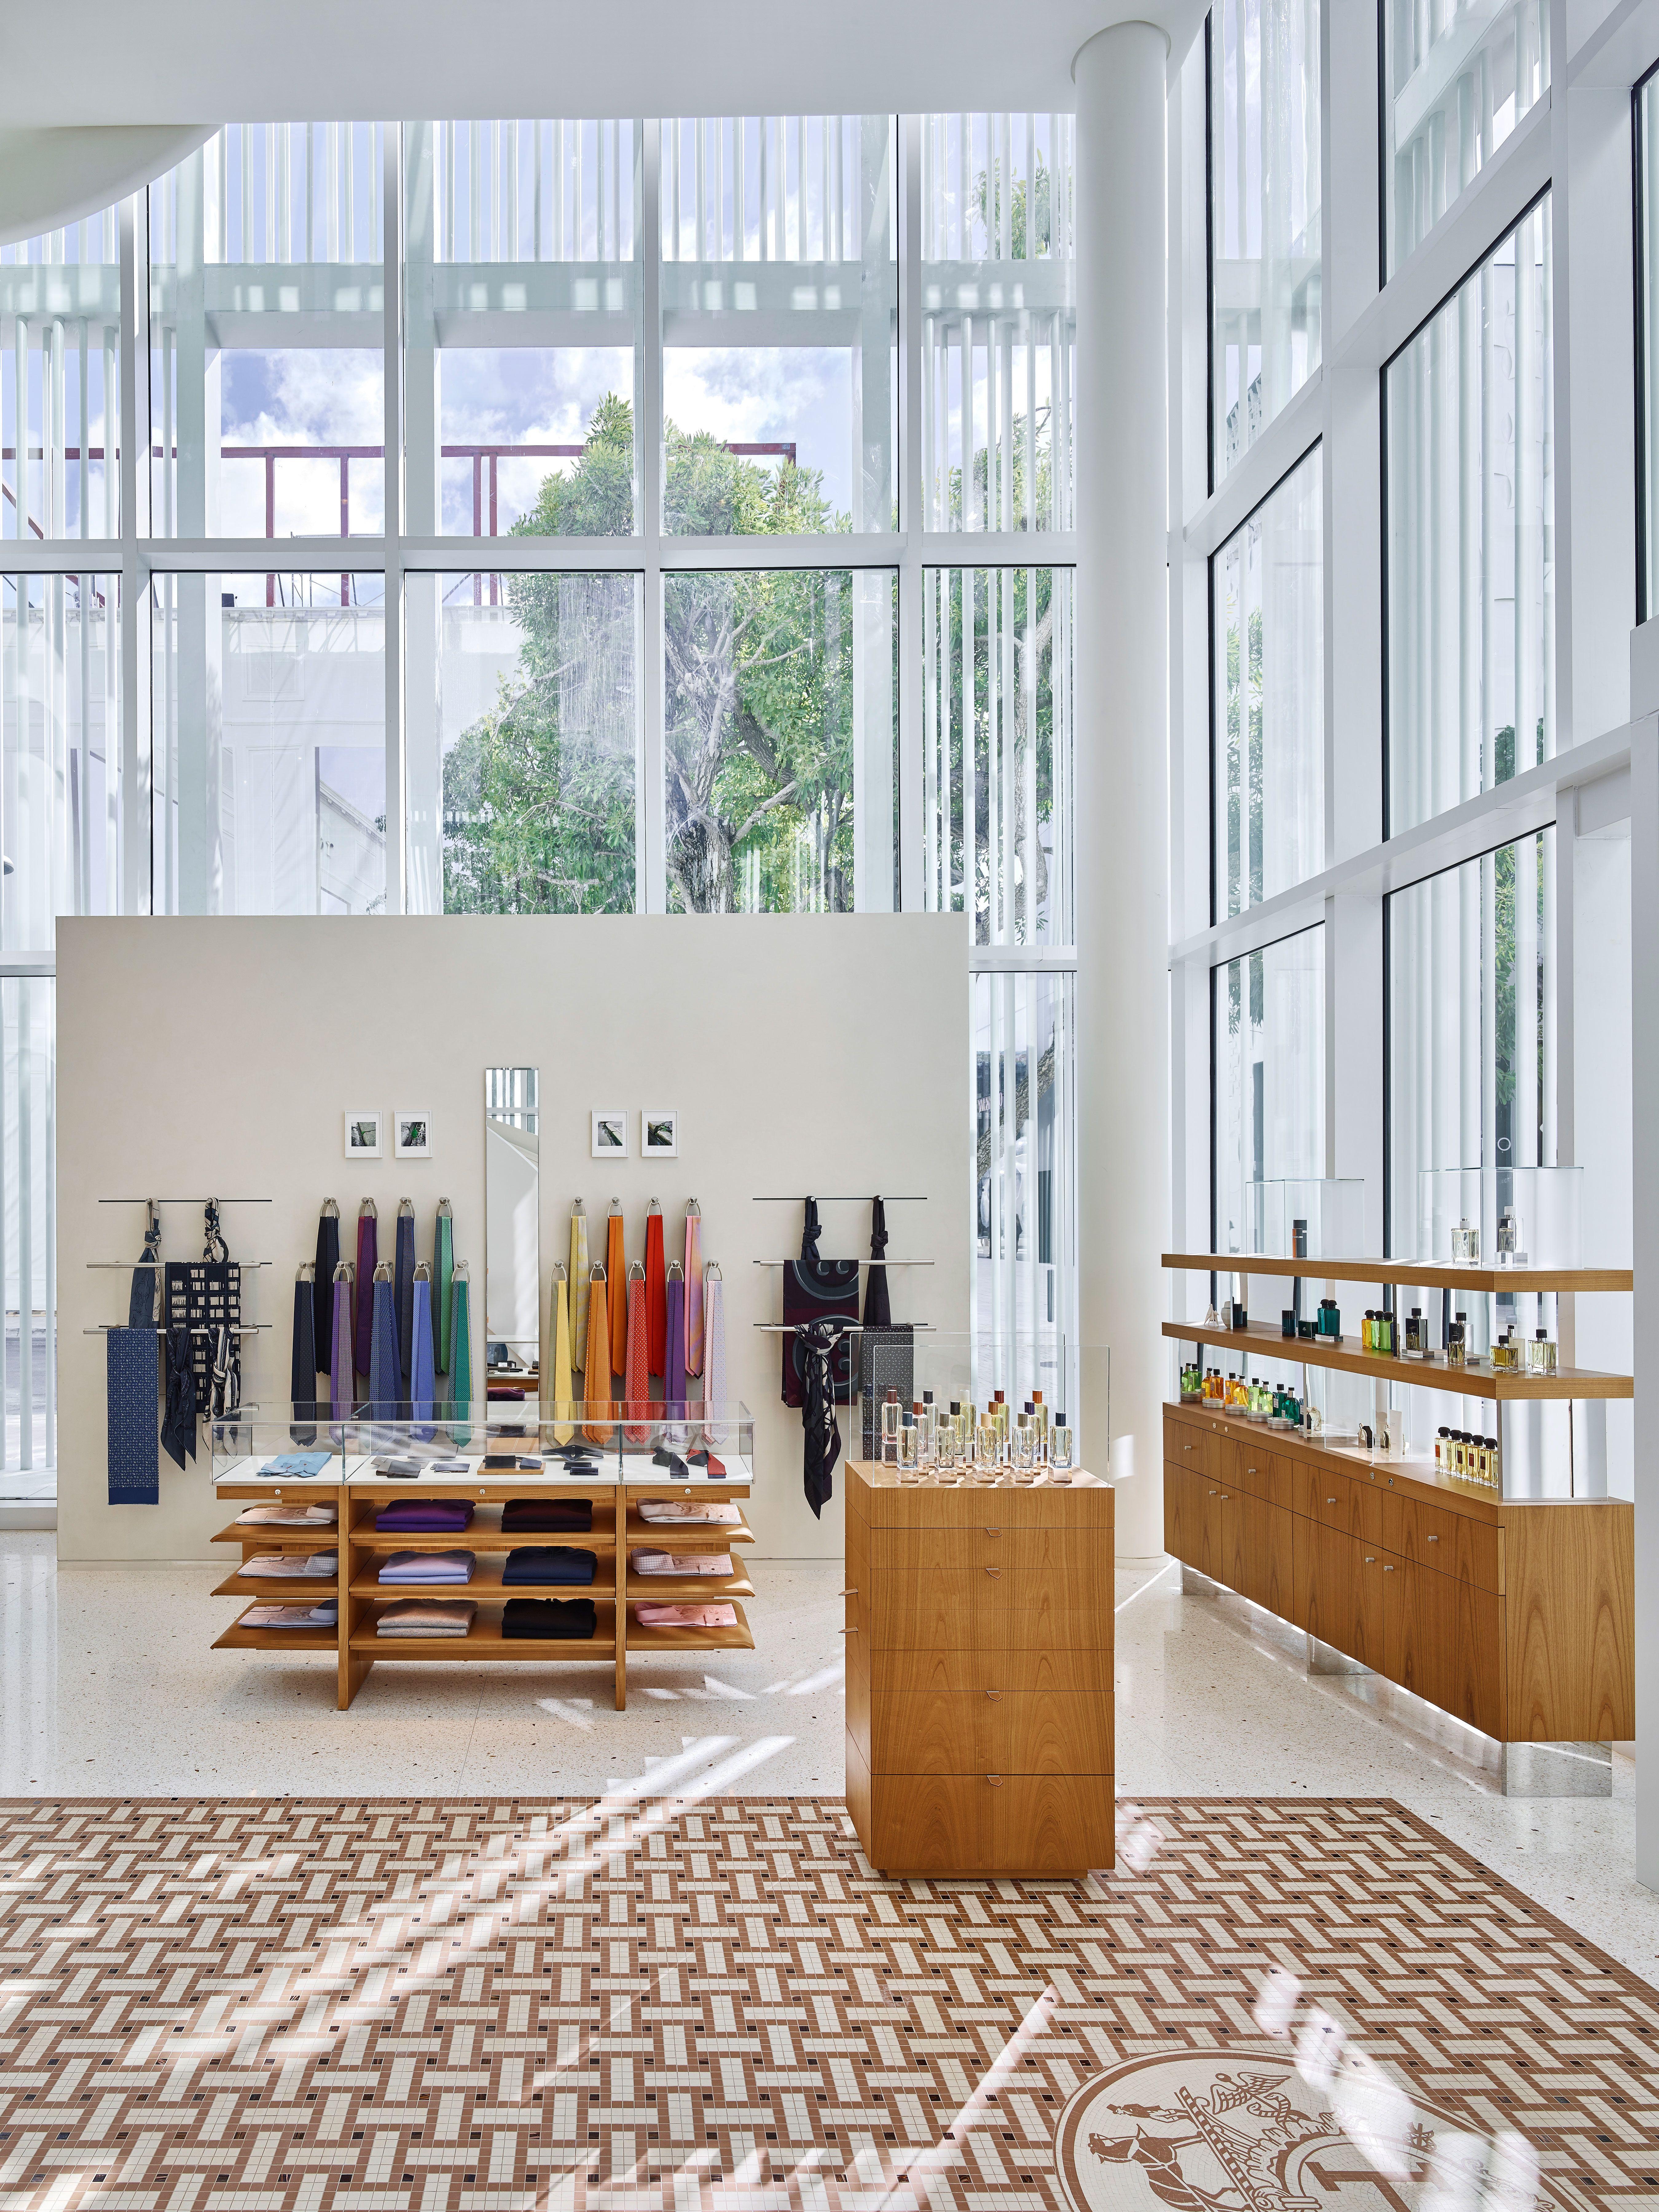 Hermès Opens a Striking New Shop in Miami\'s Design District ...